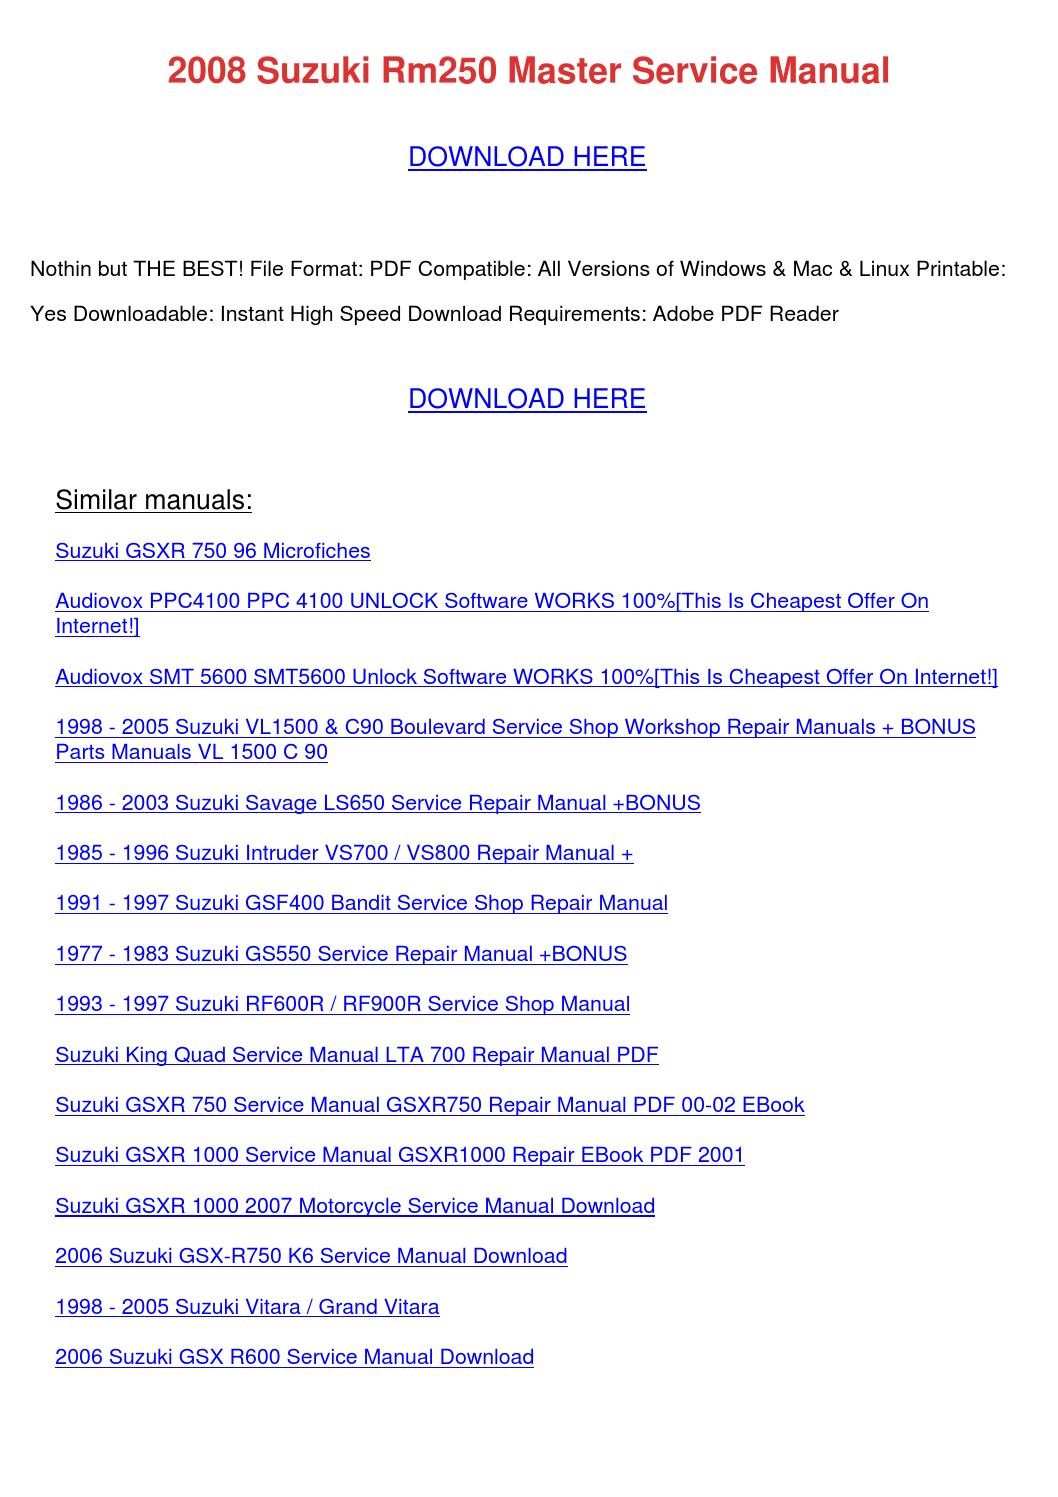 2008 Suzuki Rm250 Master Service Manual By Lakeshakessler